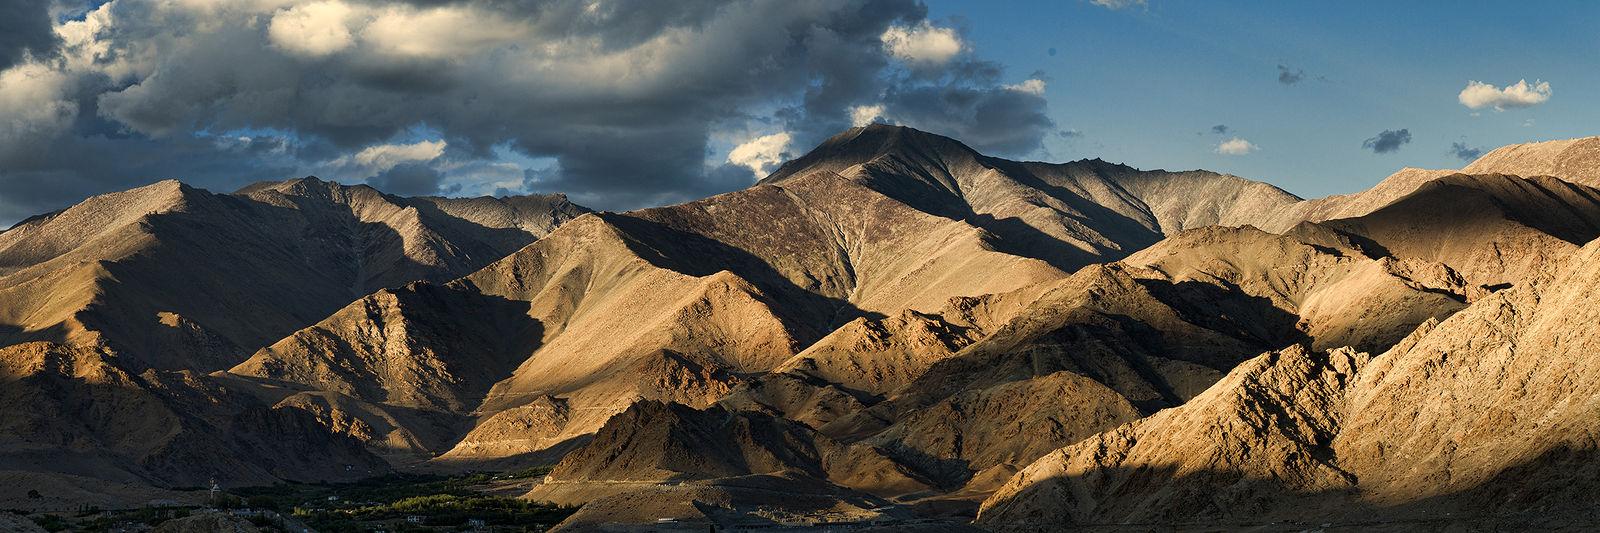 Ivan Aleshin. NH21 and other Himalayan Roads. 0004